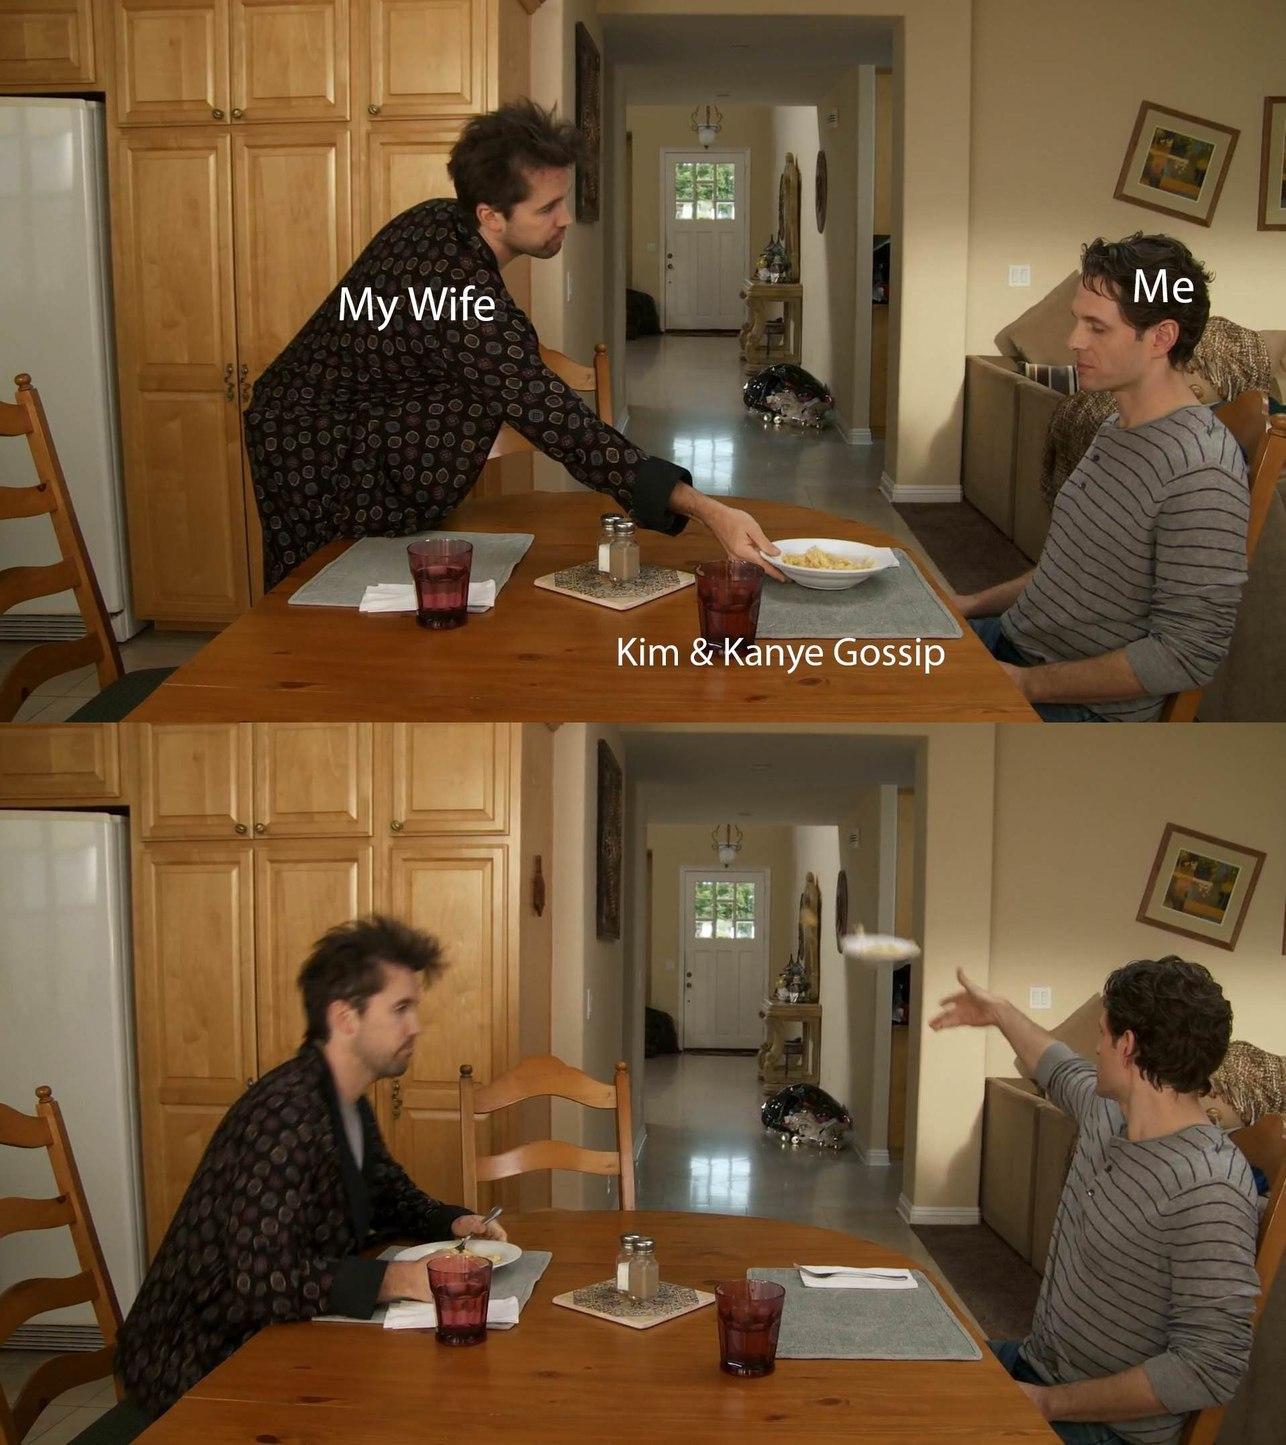 My First Original - meme